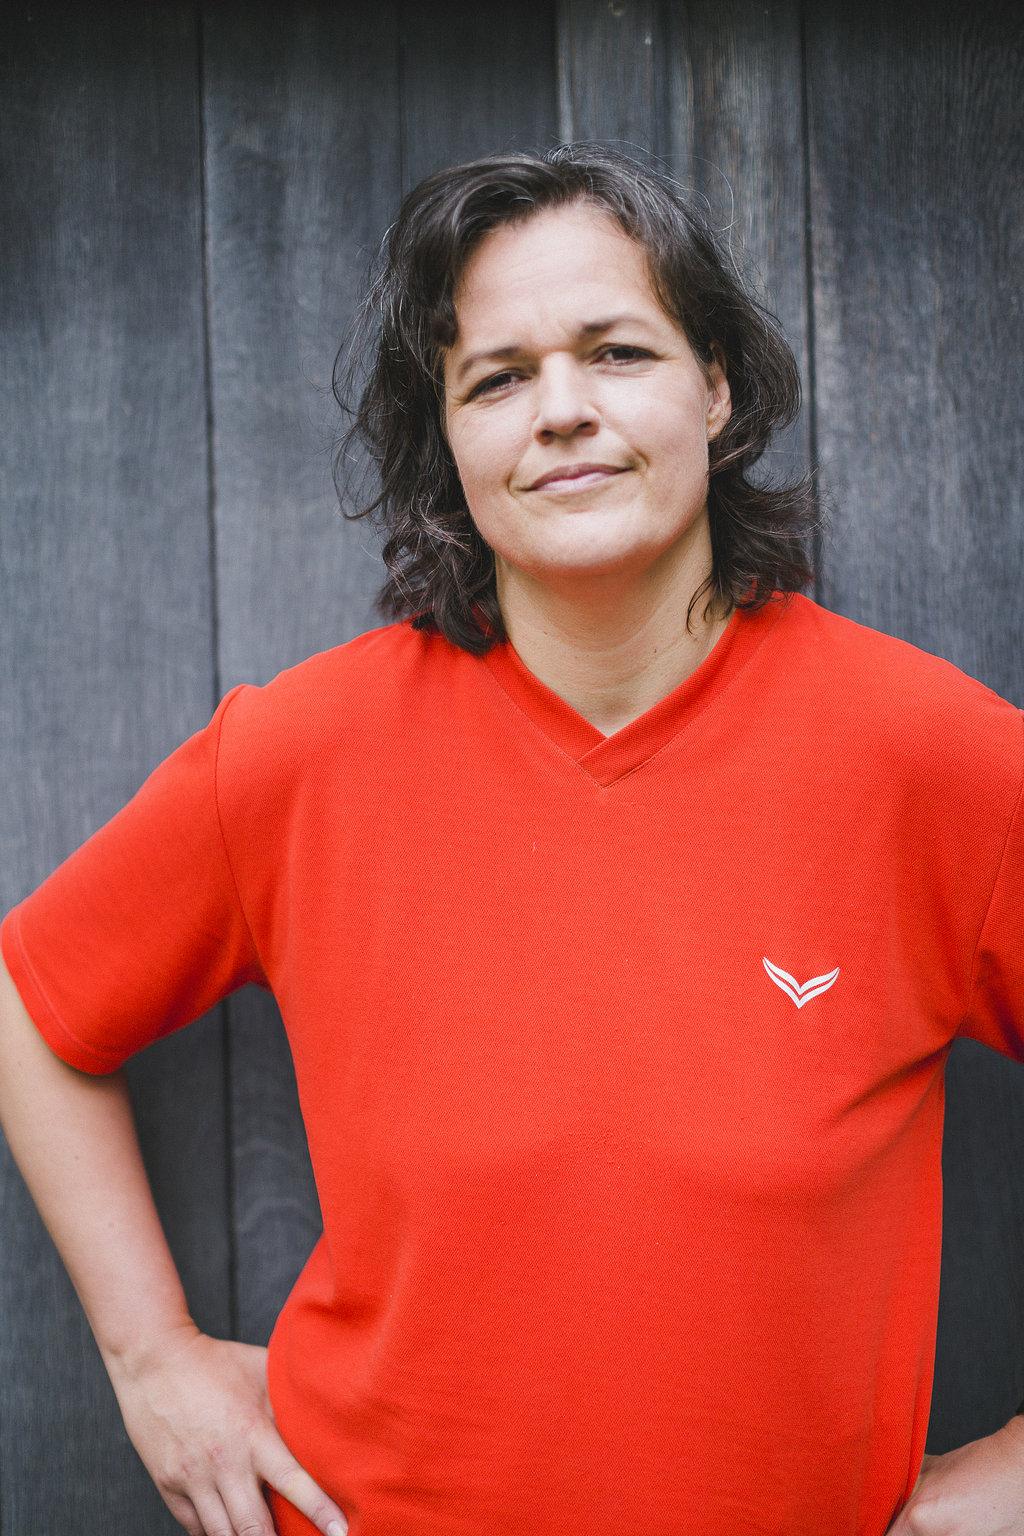 Die Fitnesstrainerin Simone Brune